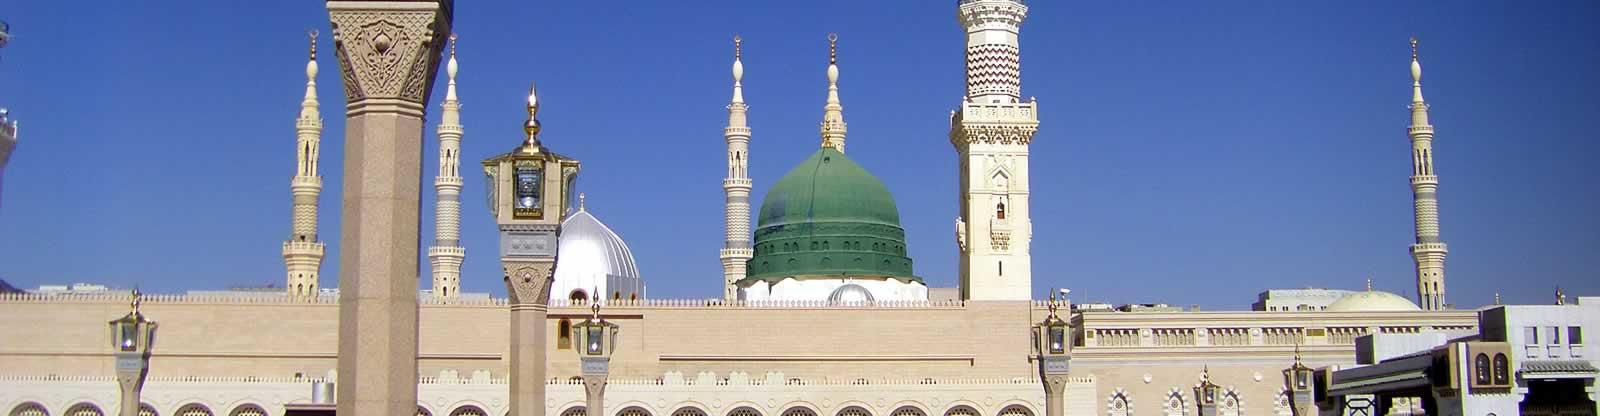 Umrah Banner: Book Hajj And Umrah Packages